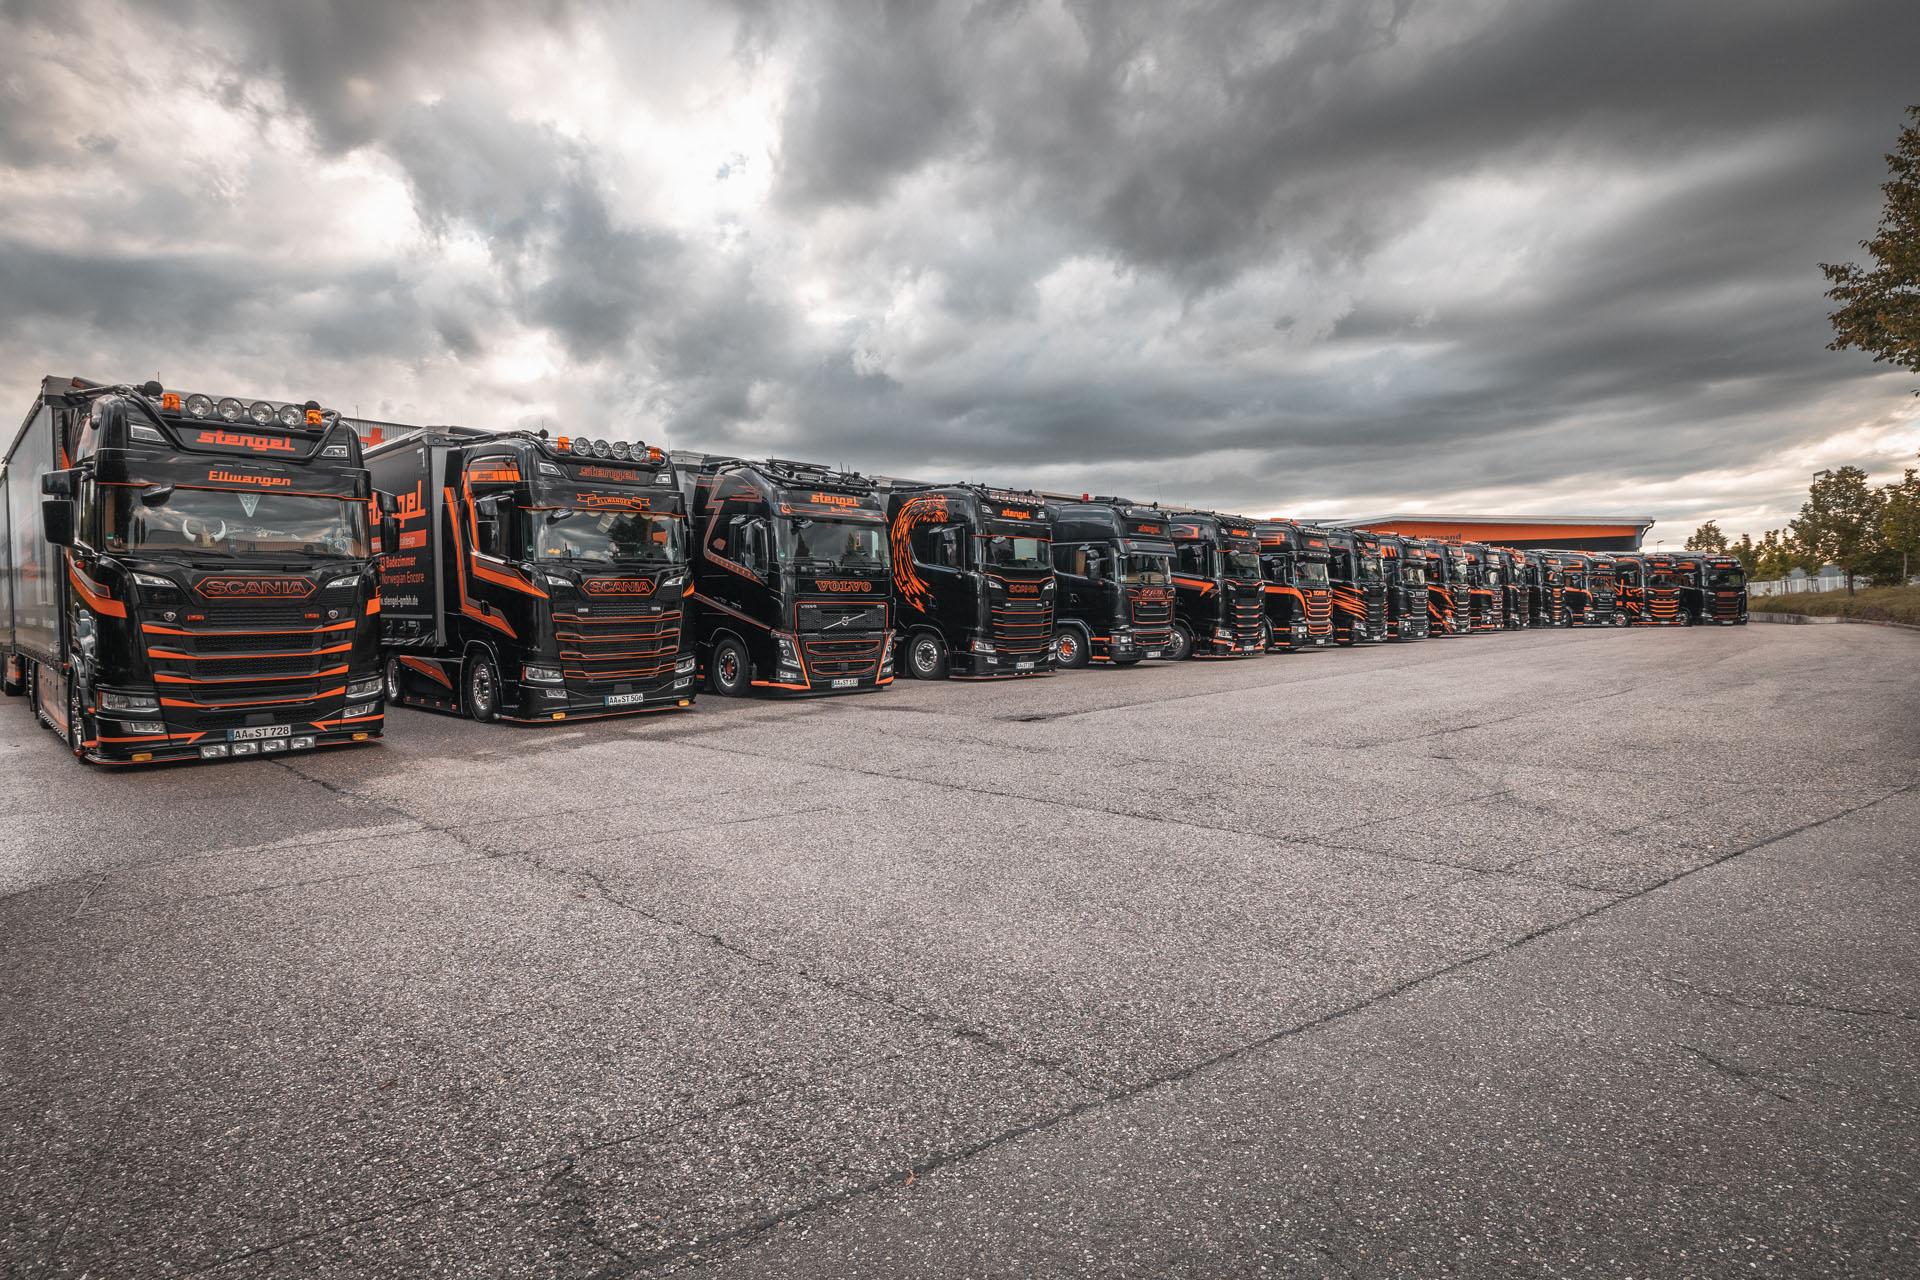 LKW Flotte Stengel GmbH